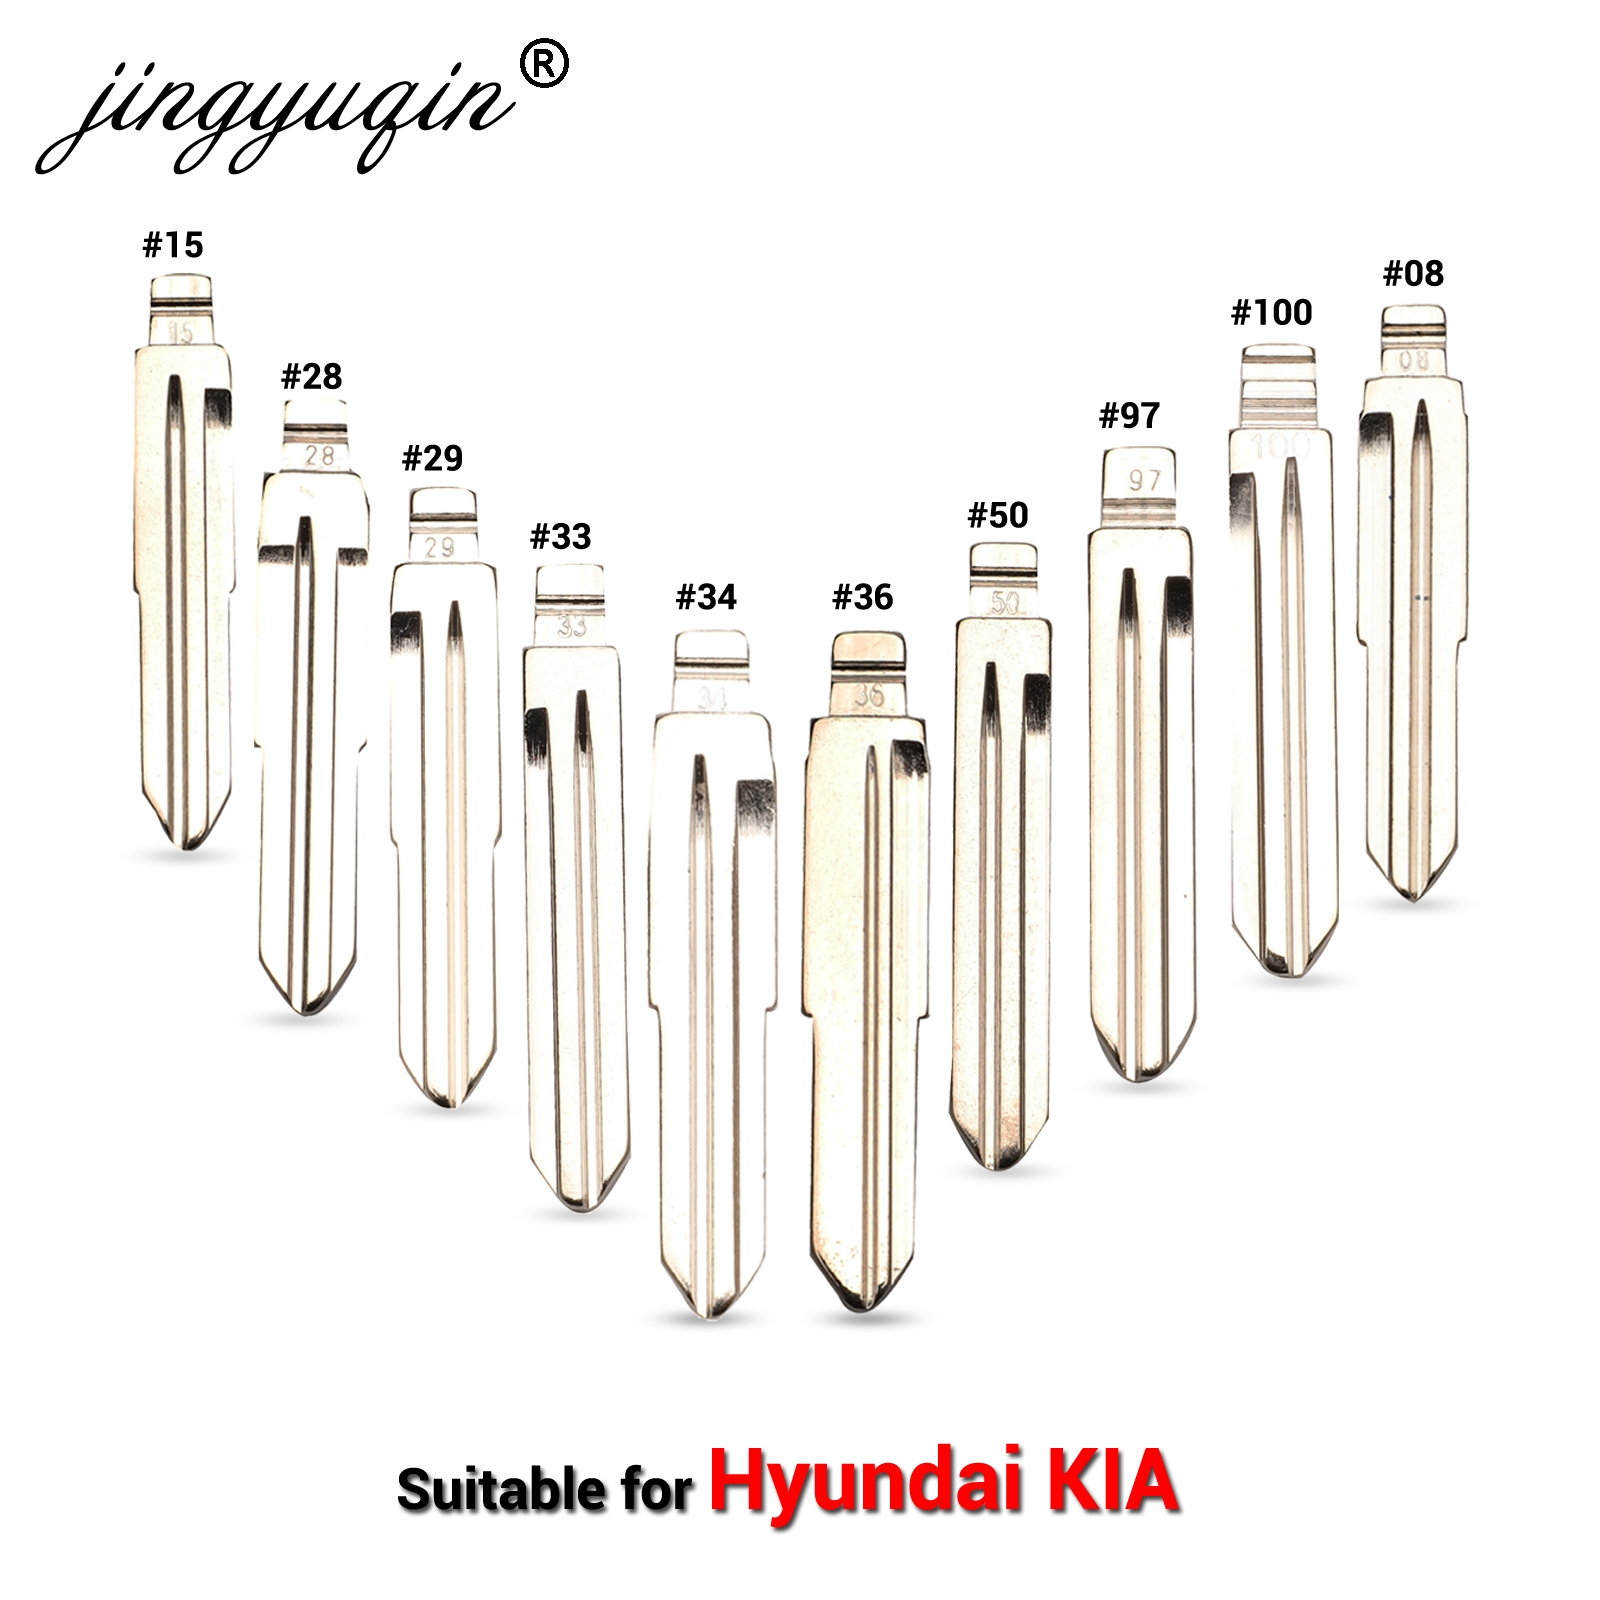 Clé jingyuqin vierge pour Hyundai Tucson Accent Getz Matri sonate Santa fe Kia HYN14RFH KD lame de clé à rabat 08 15 28 29 36 50 97 33 #